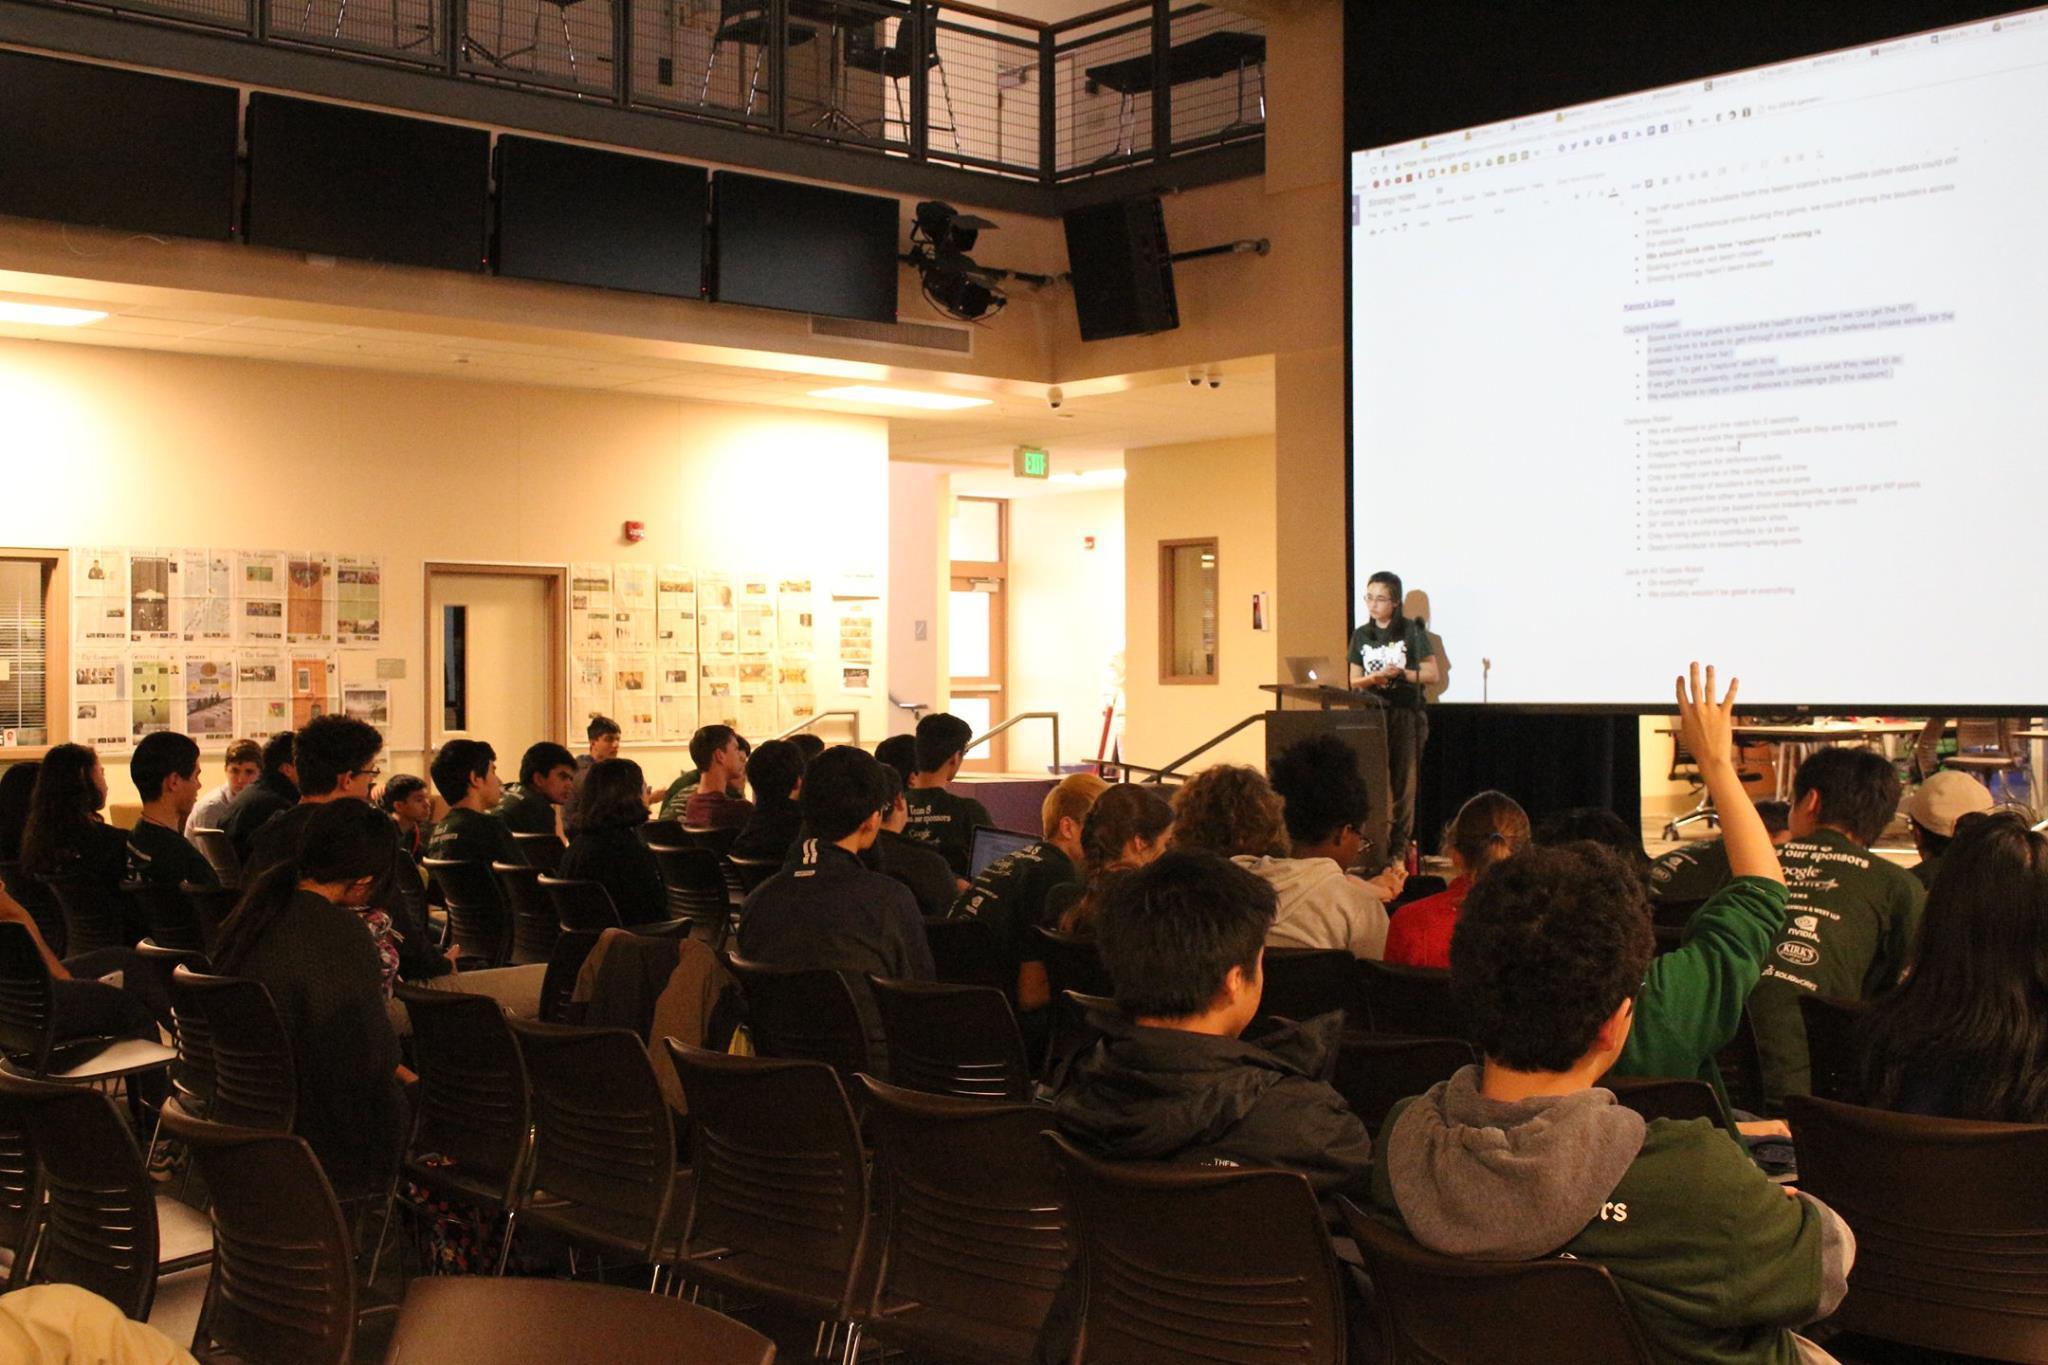 Senior and team captain Claire Kokontis leads the strategy meeting for the Palo Alto High School robotics team.